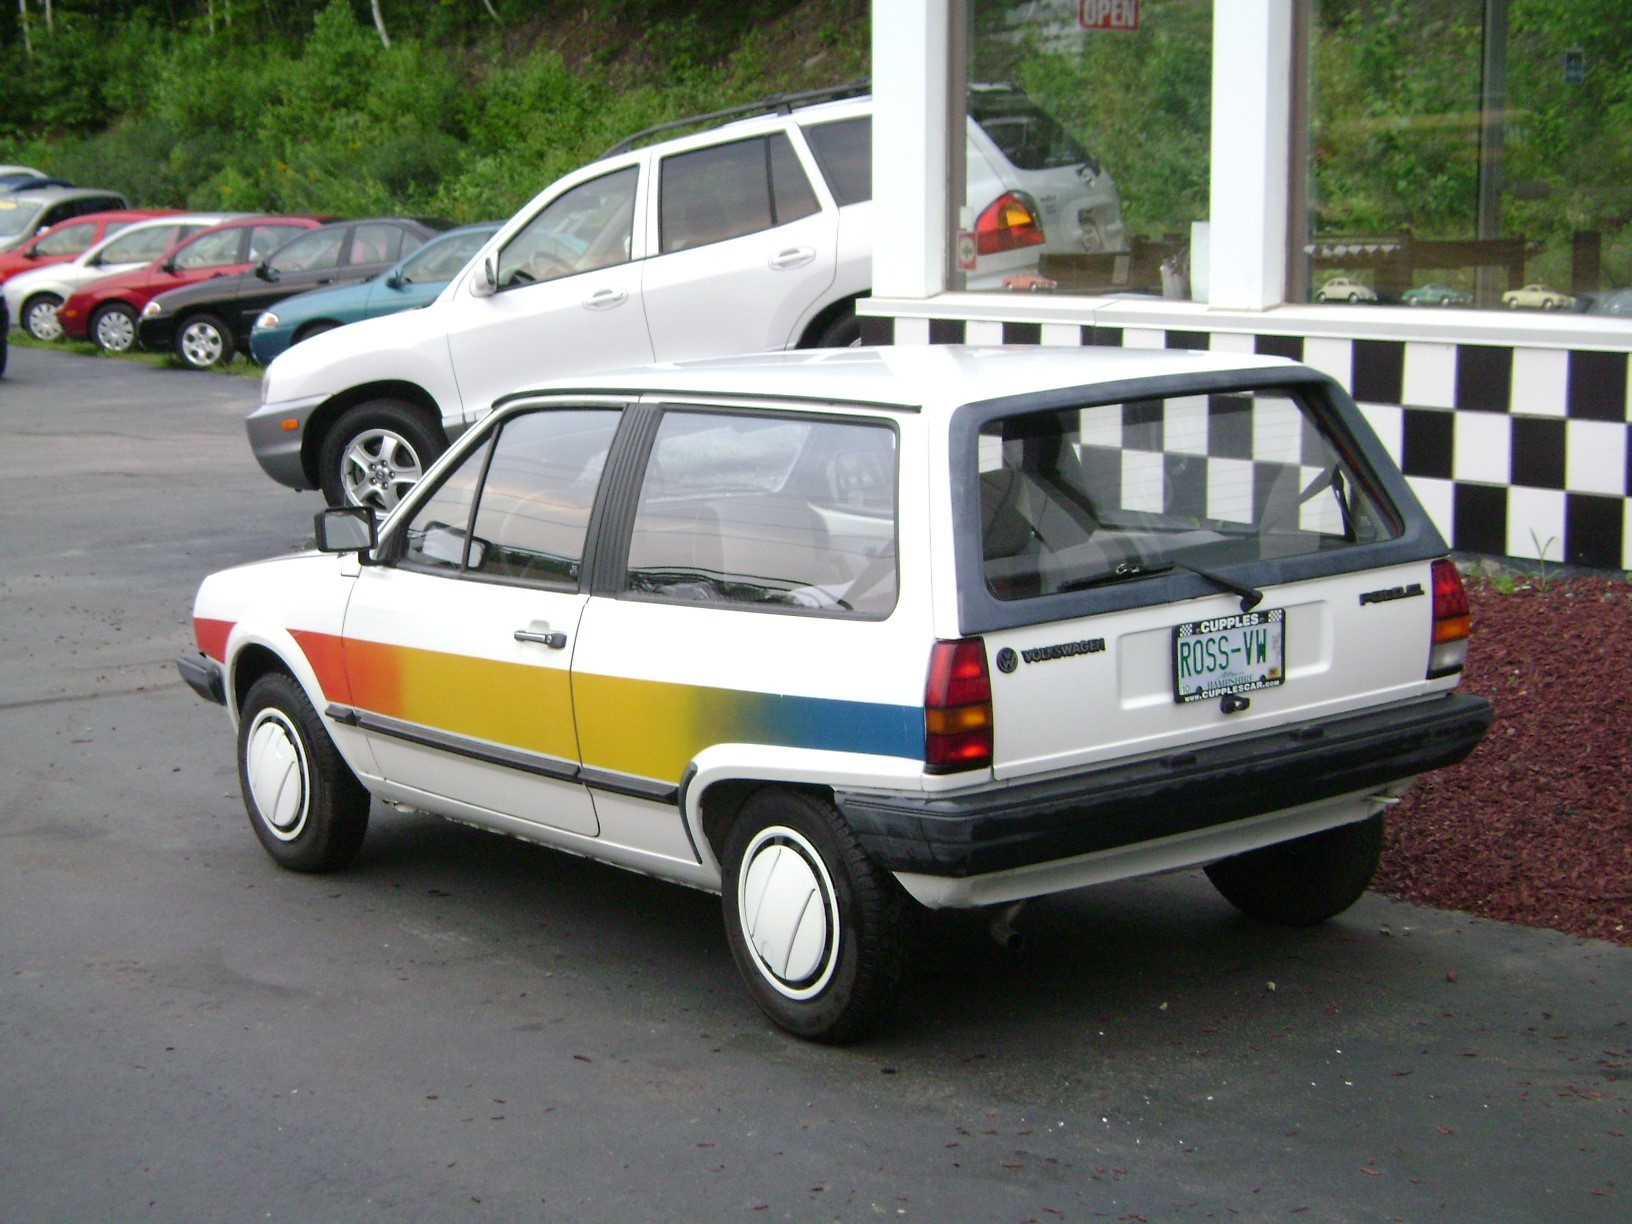 Volkswagen Oko-Polo - Volkswagen Oko-Polo